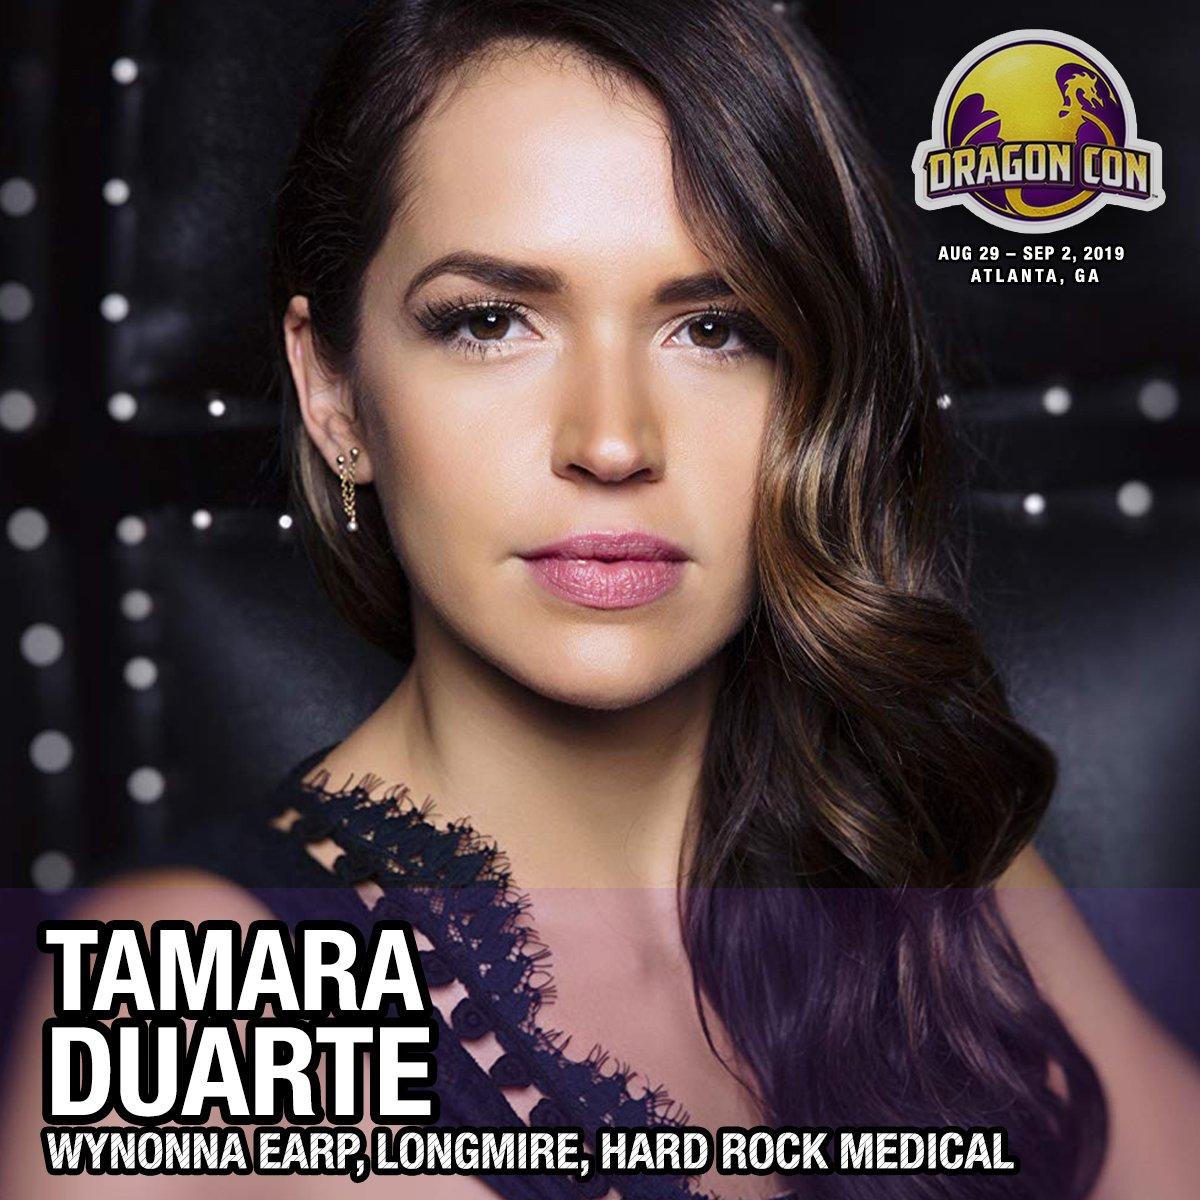 Pictures Tamara Duarte nude photos 2019